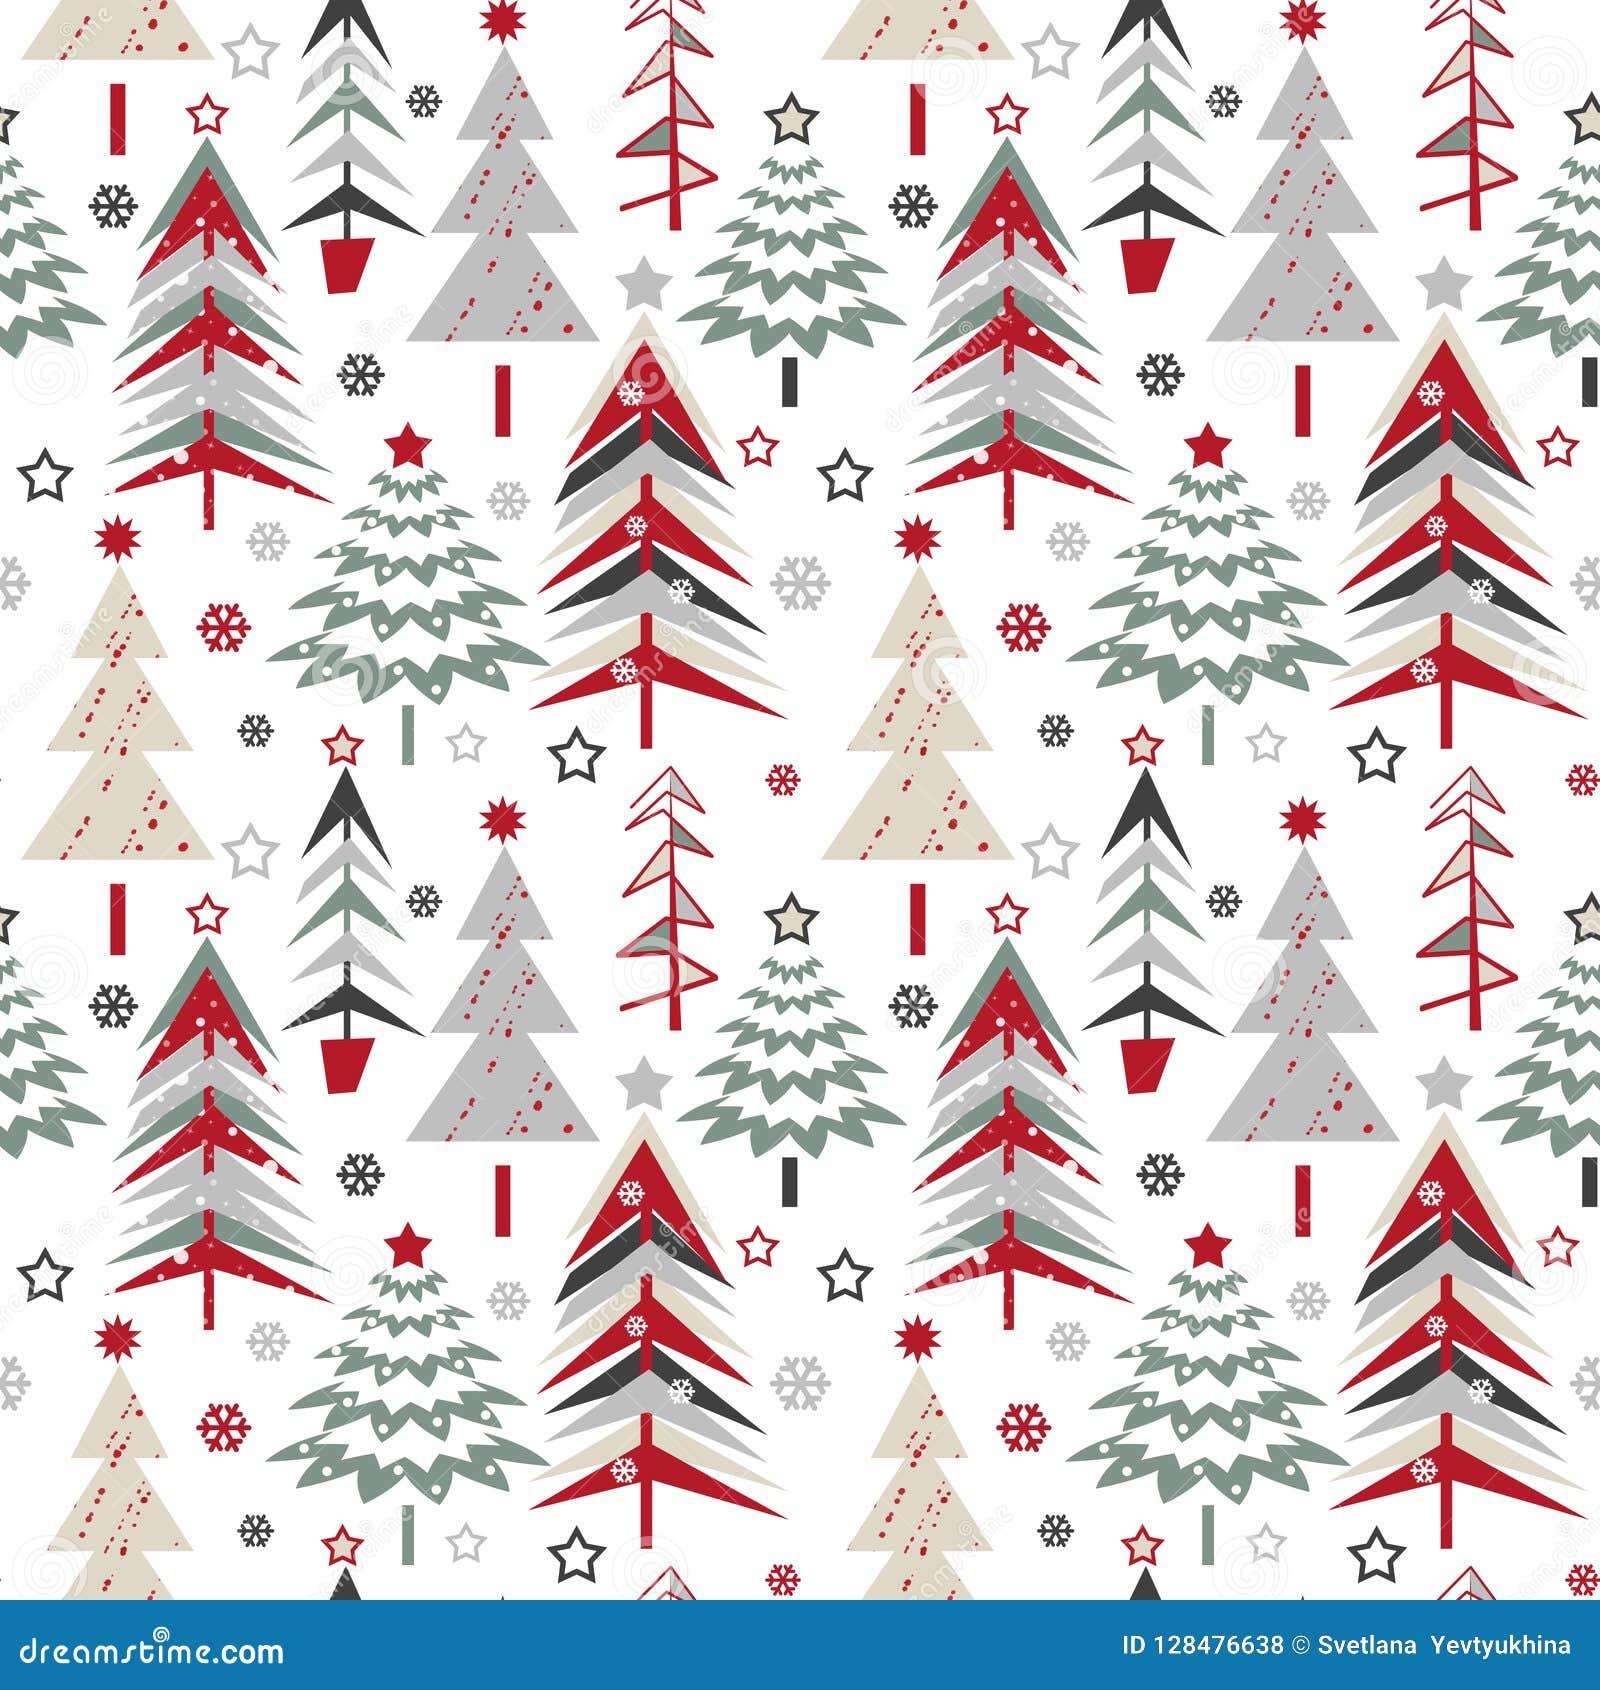 Seamless Christmas Pattern With Cartoon Christmas Trees On White ...